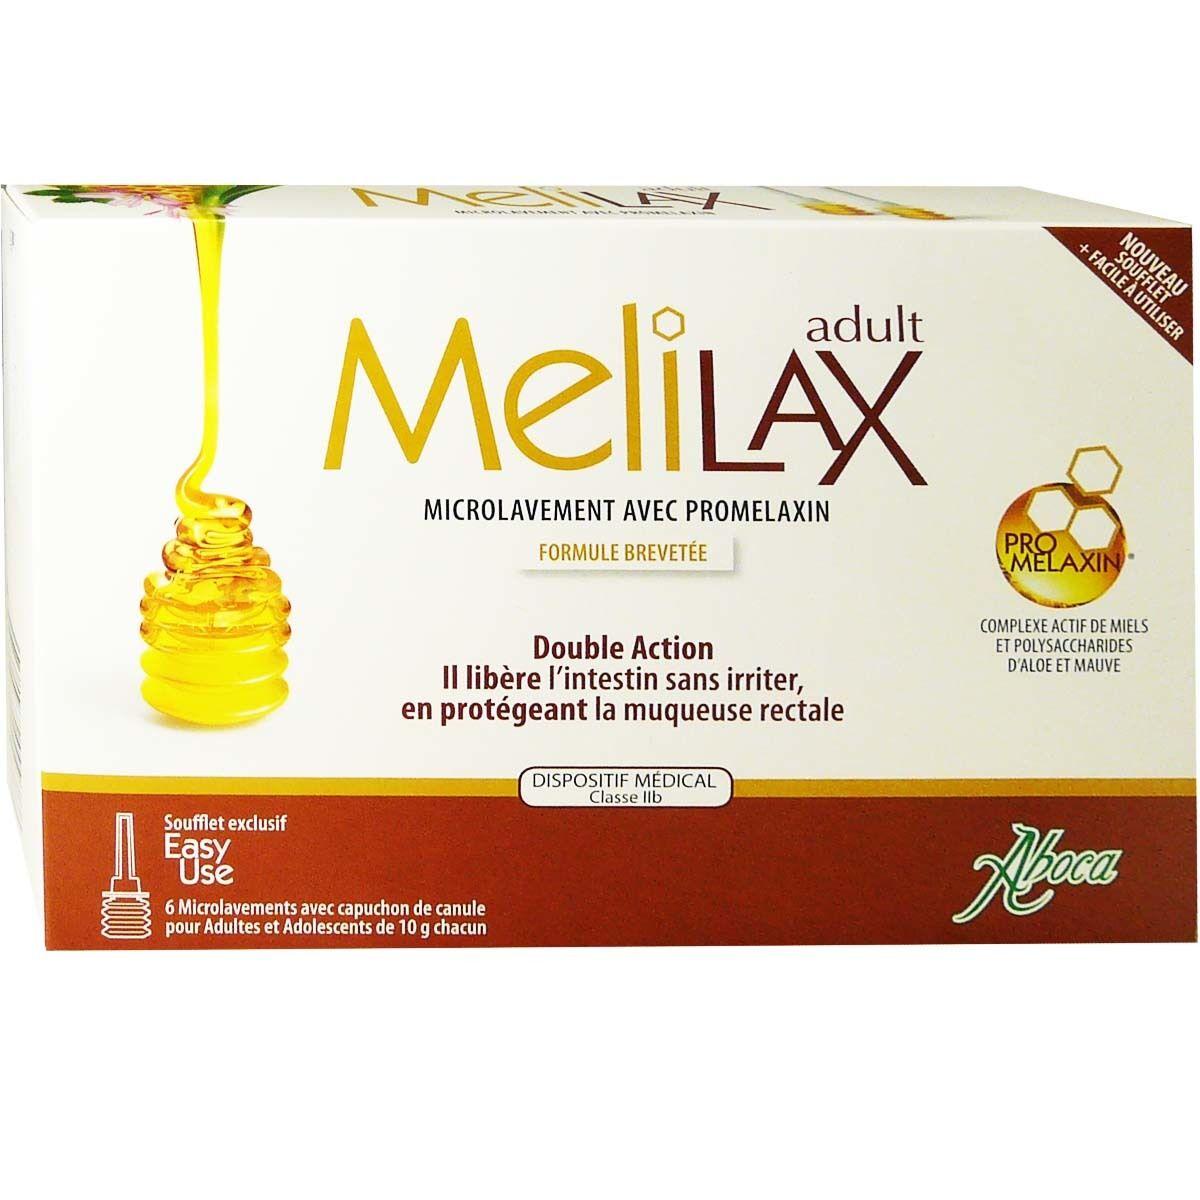 Aboca melilax adulte microlavement avec promelaxin 6 dosettes